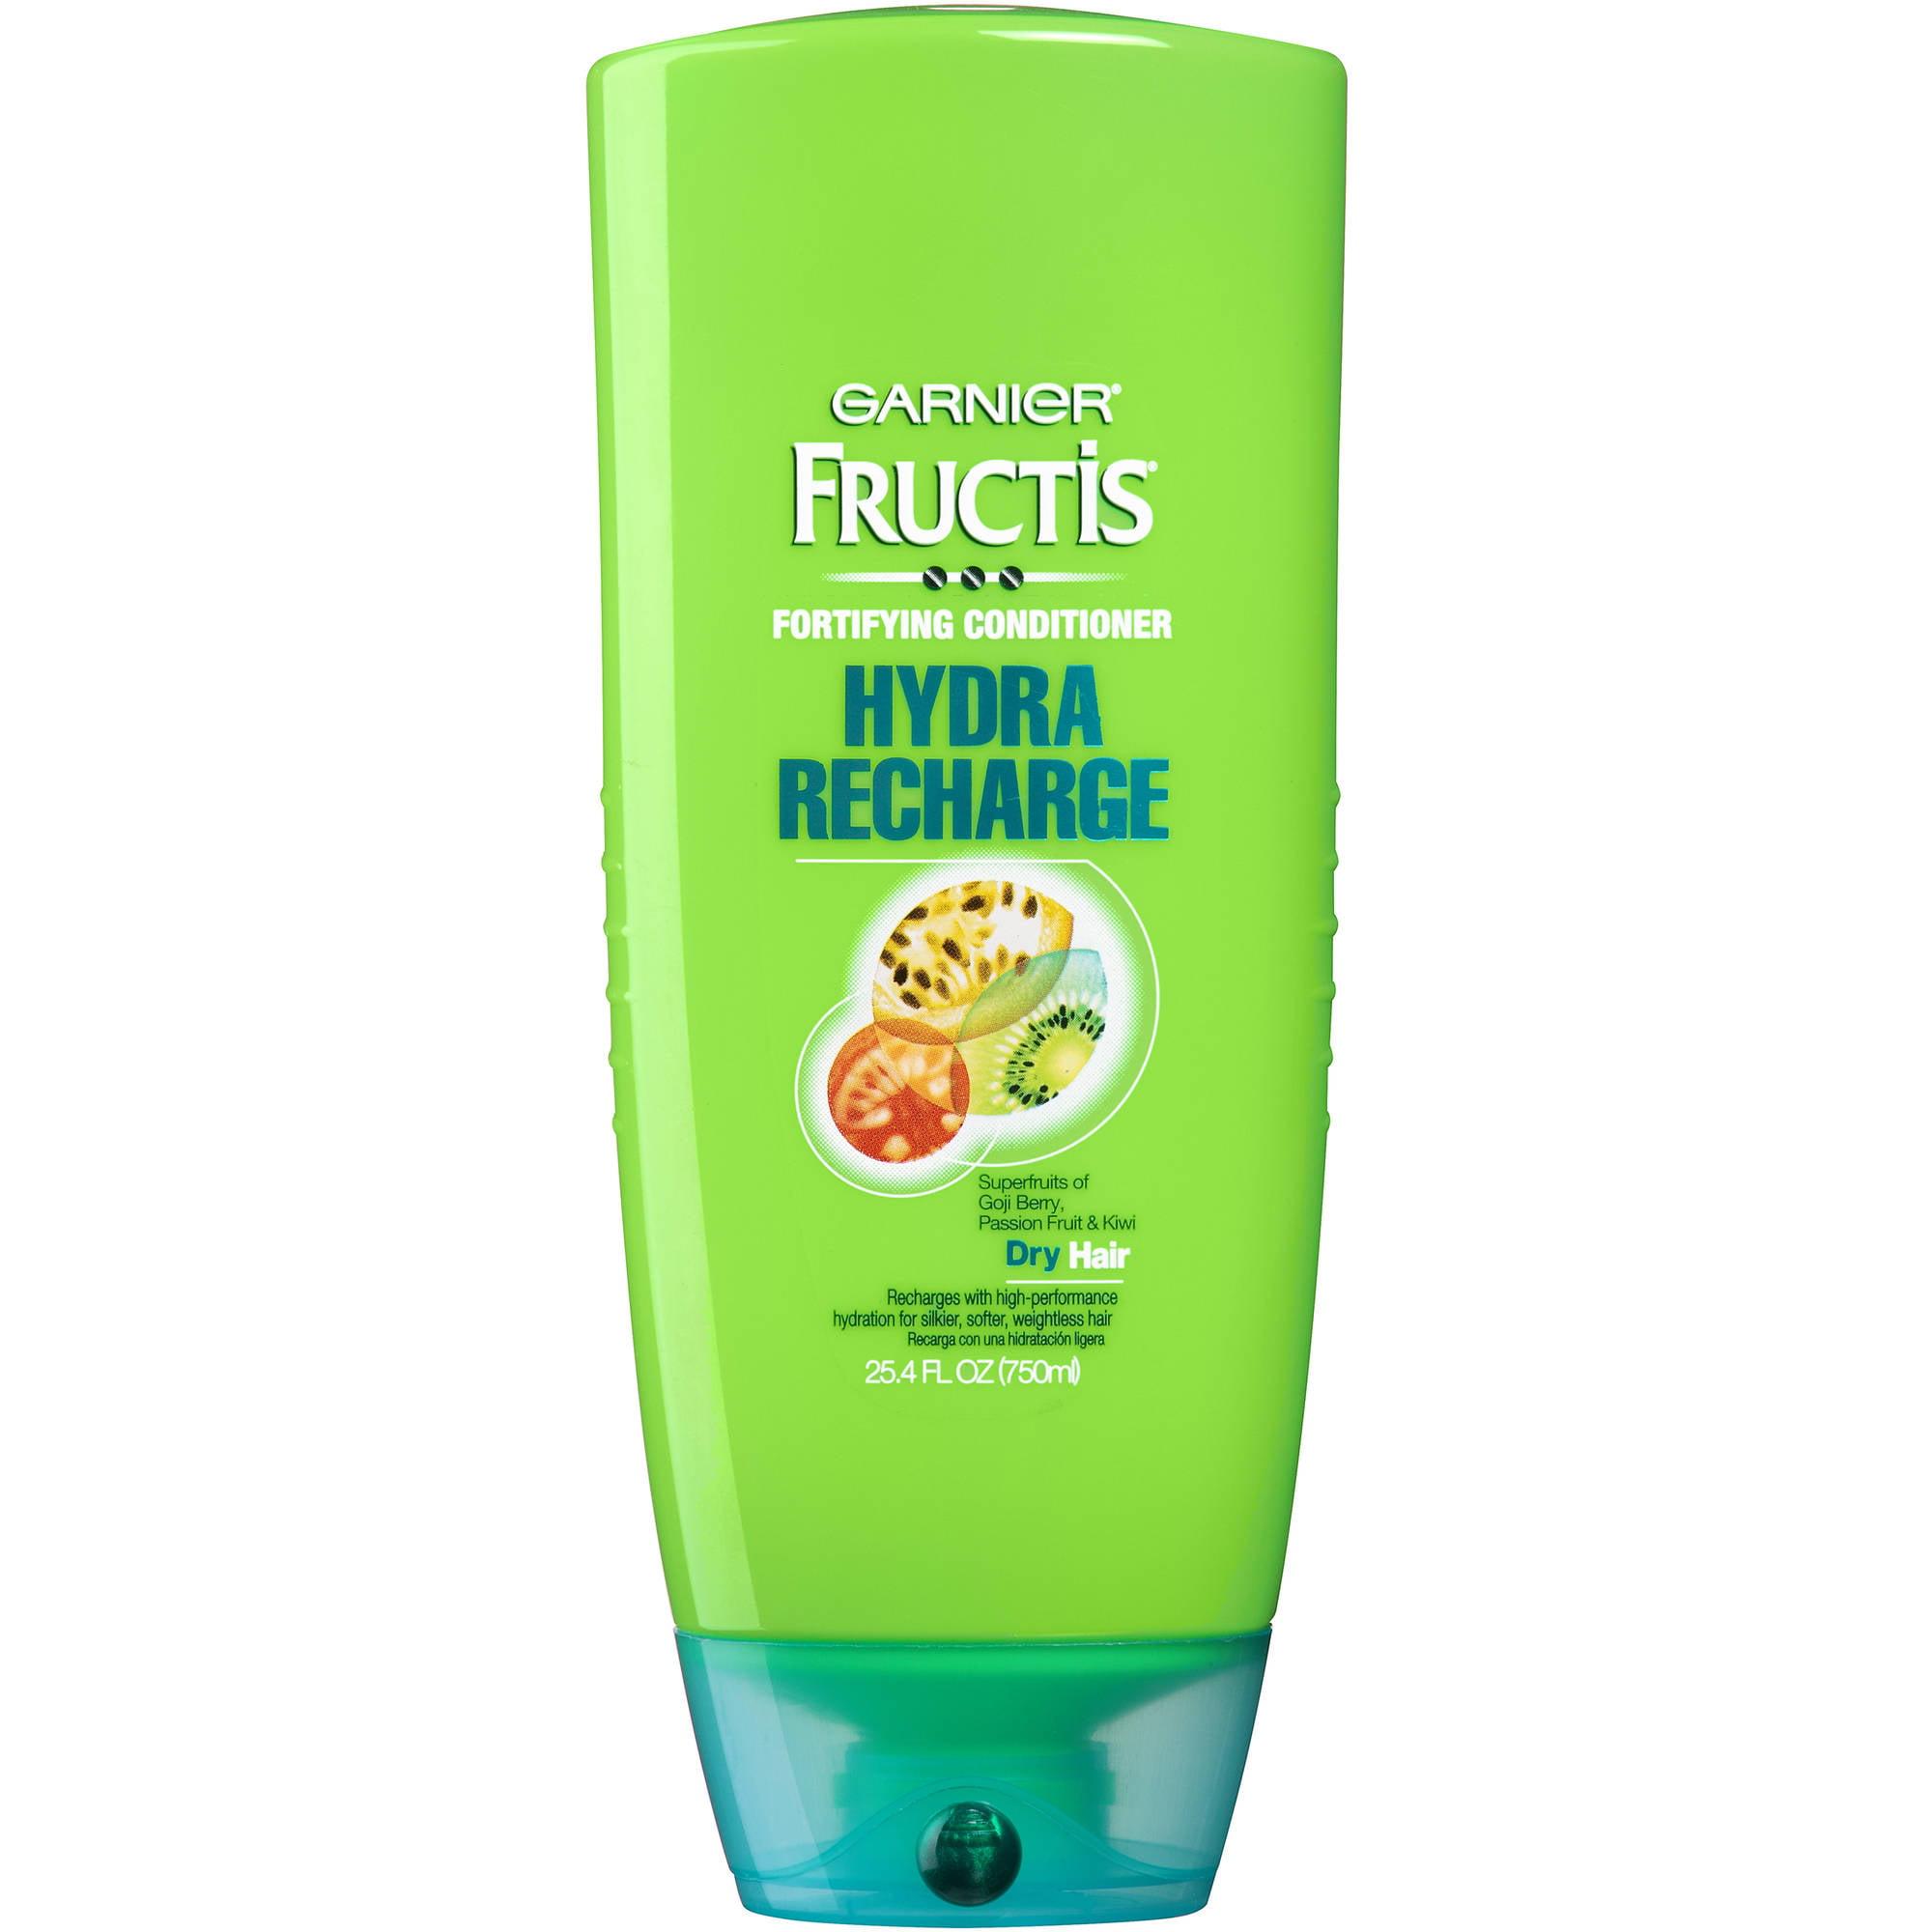 Garnier Fructis Hydra Recharge Fortifying Conditioner, 25.4 fl oz